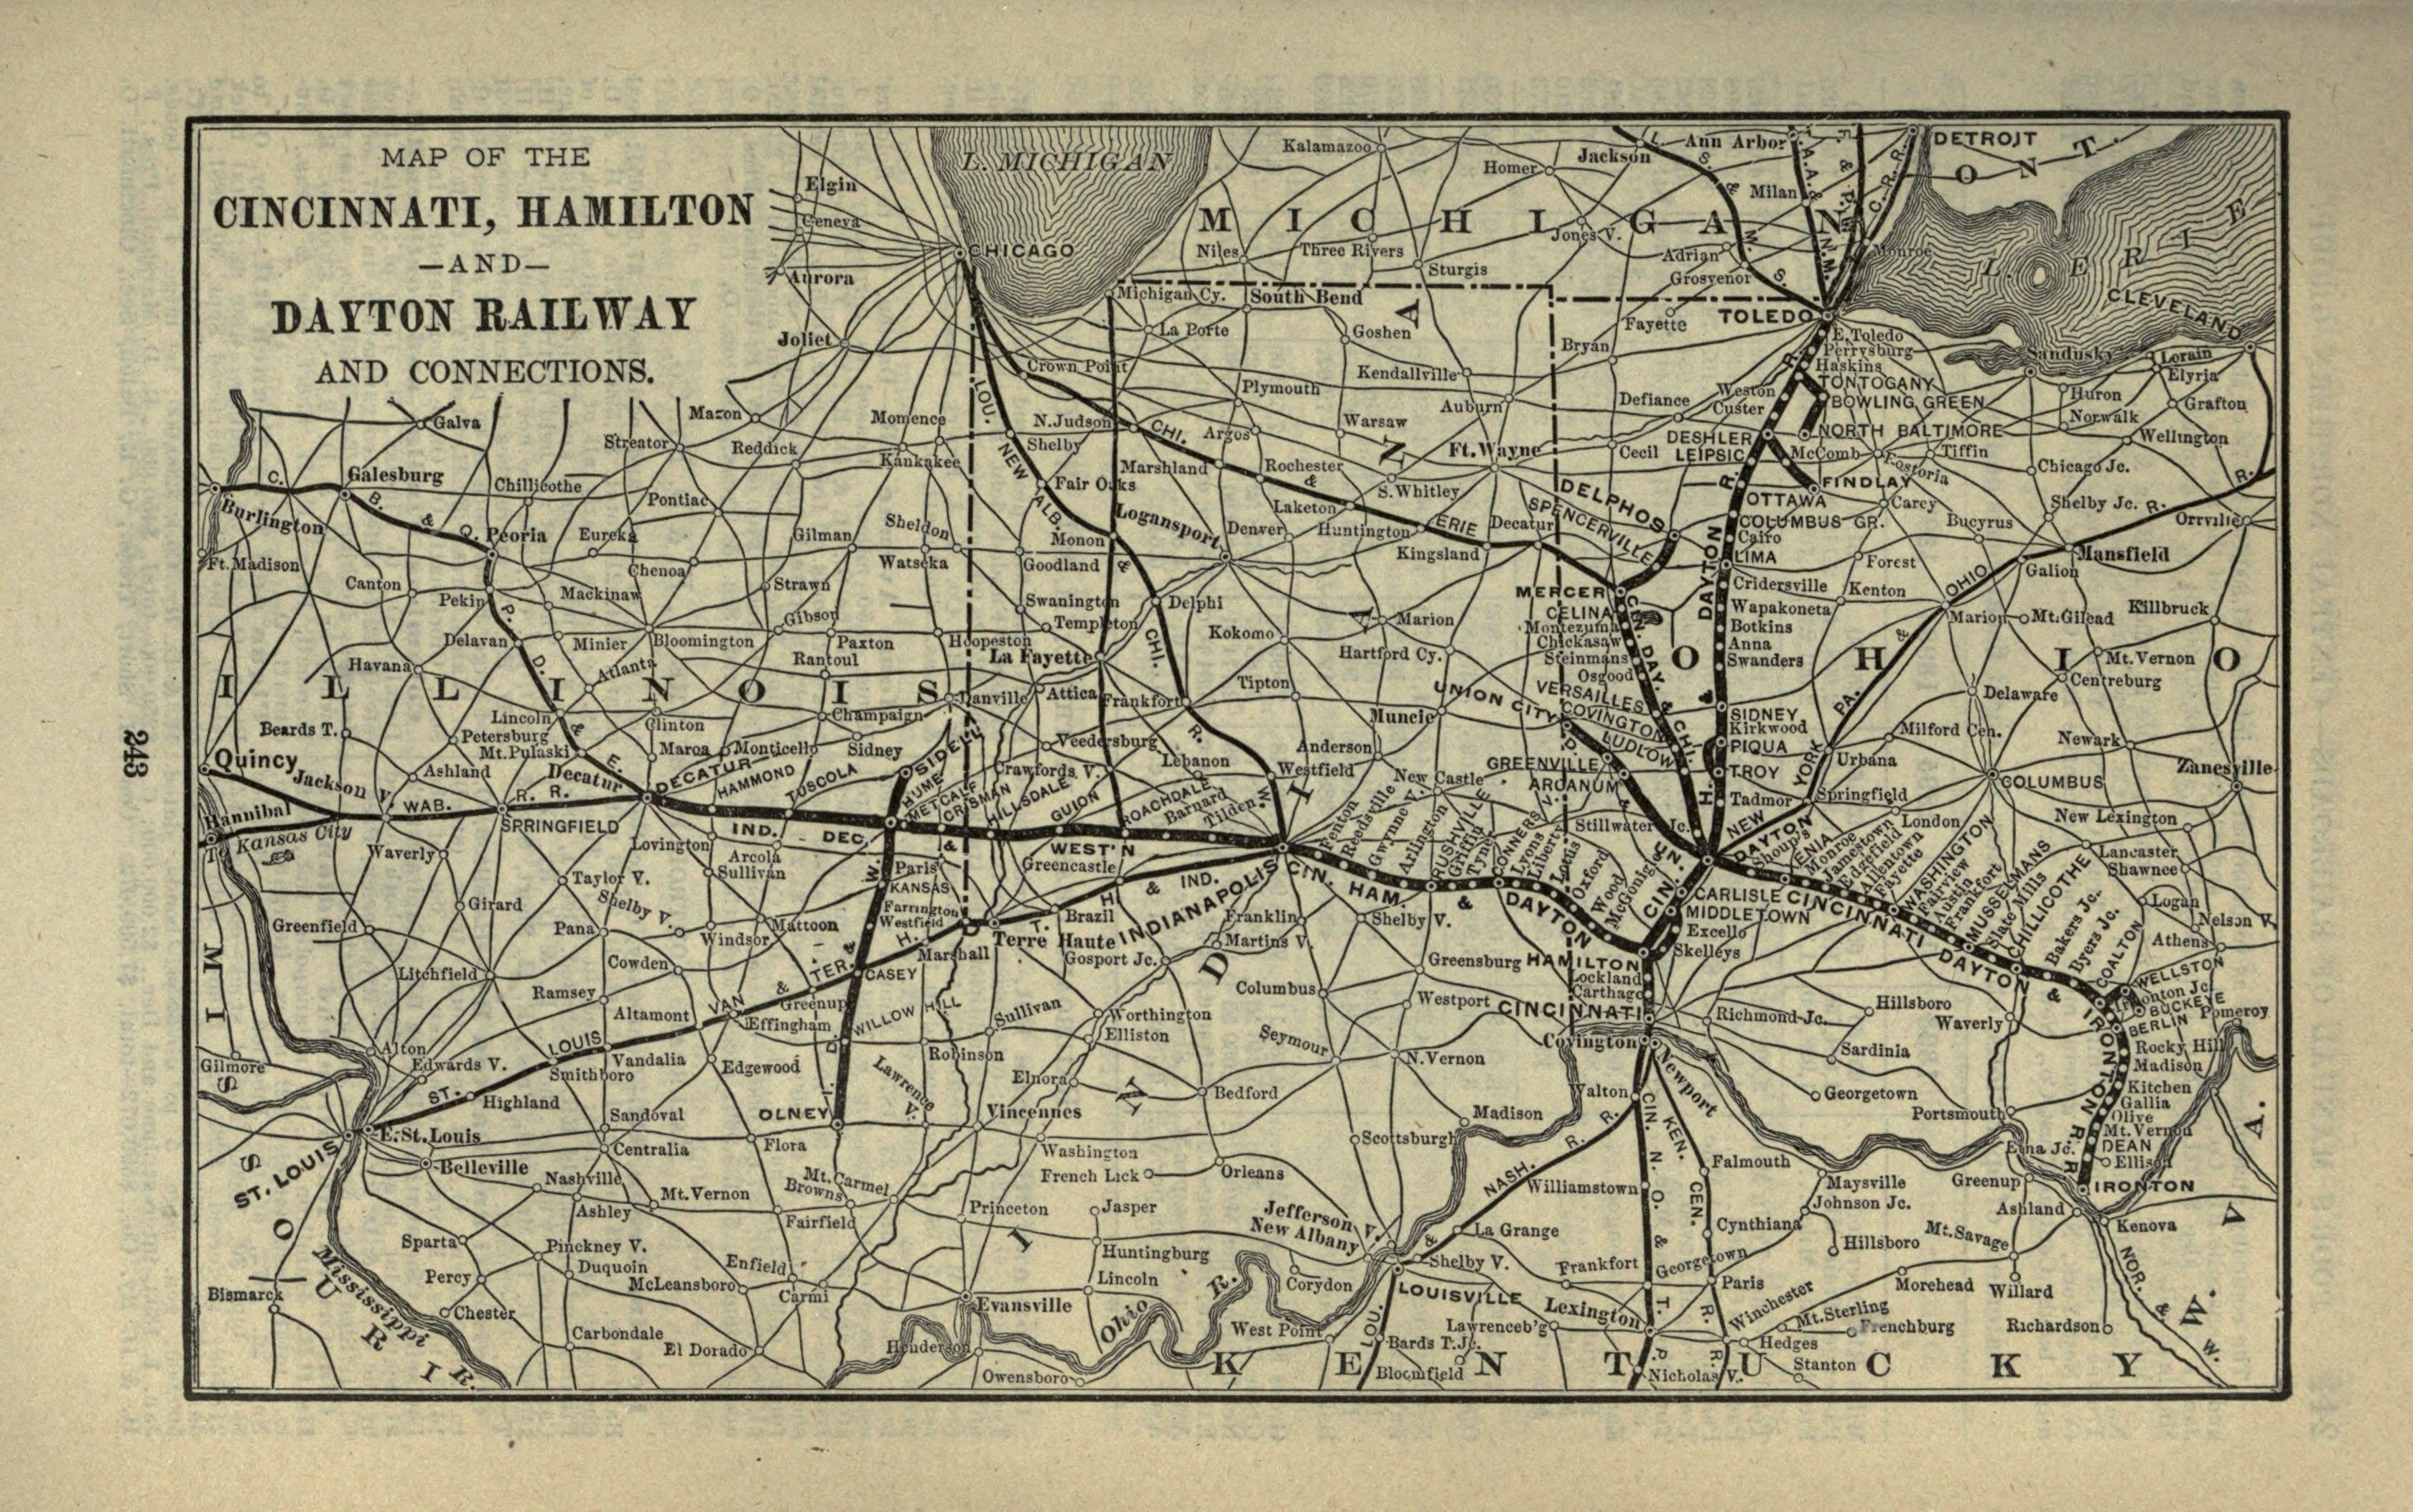 Historical Information On The Greater Cincinnati Region